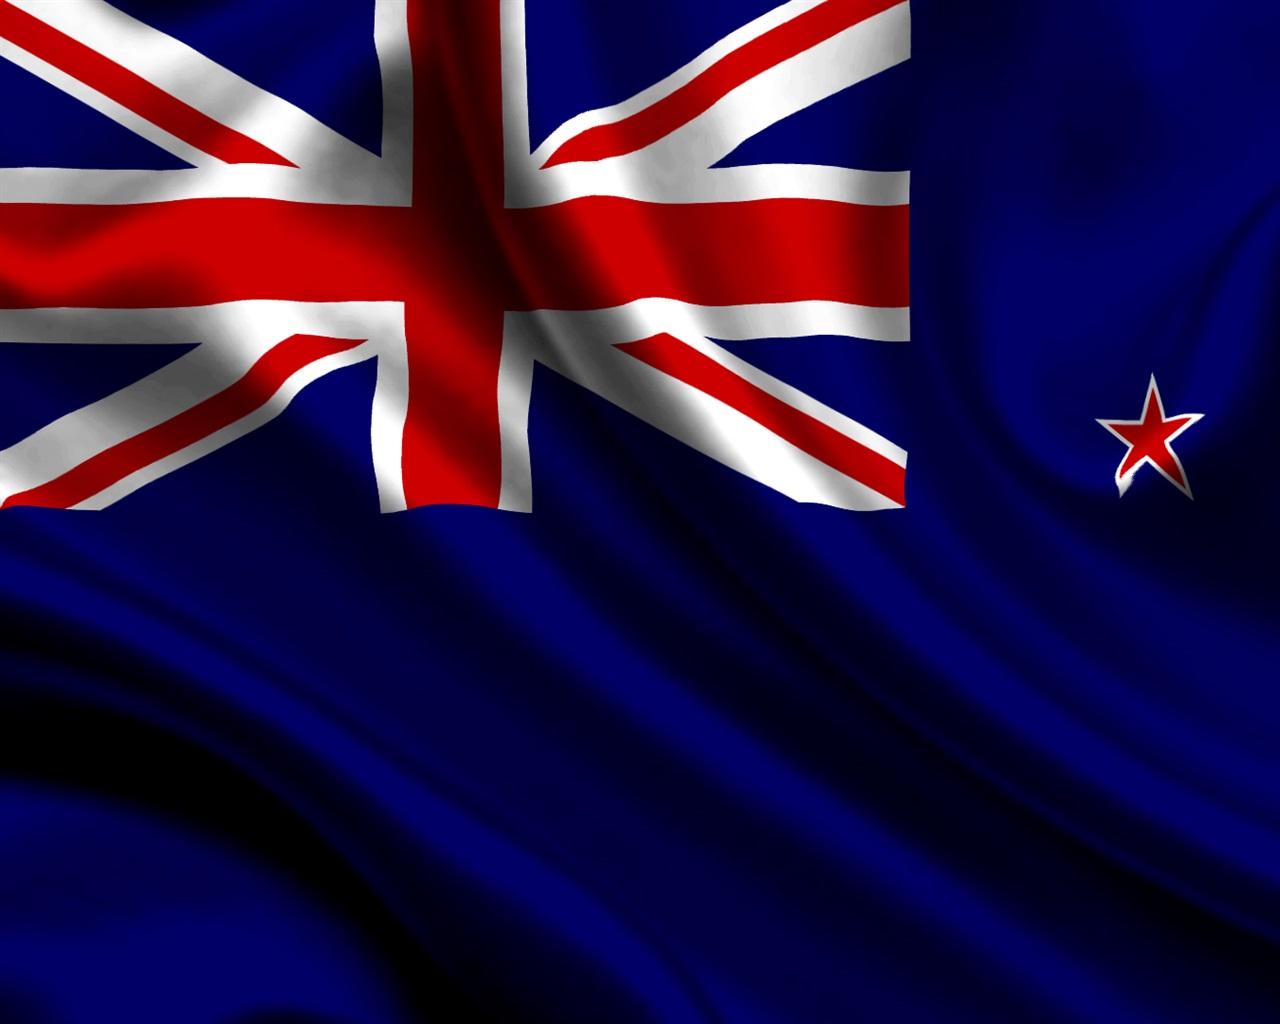 New Zealand Flag Wallpaper: Wallpaper New Zealand Flag 1920x1080 Full HD 2K Picture, Image